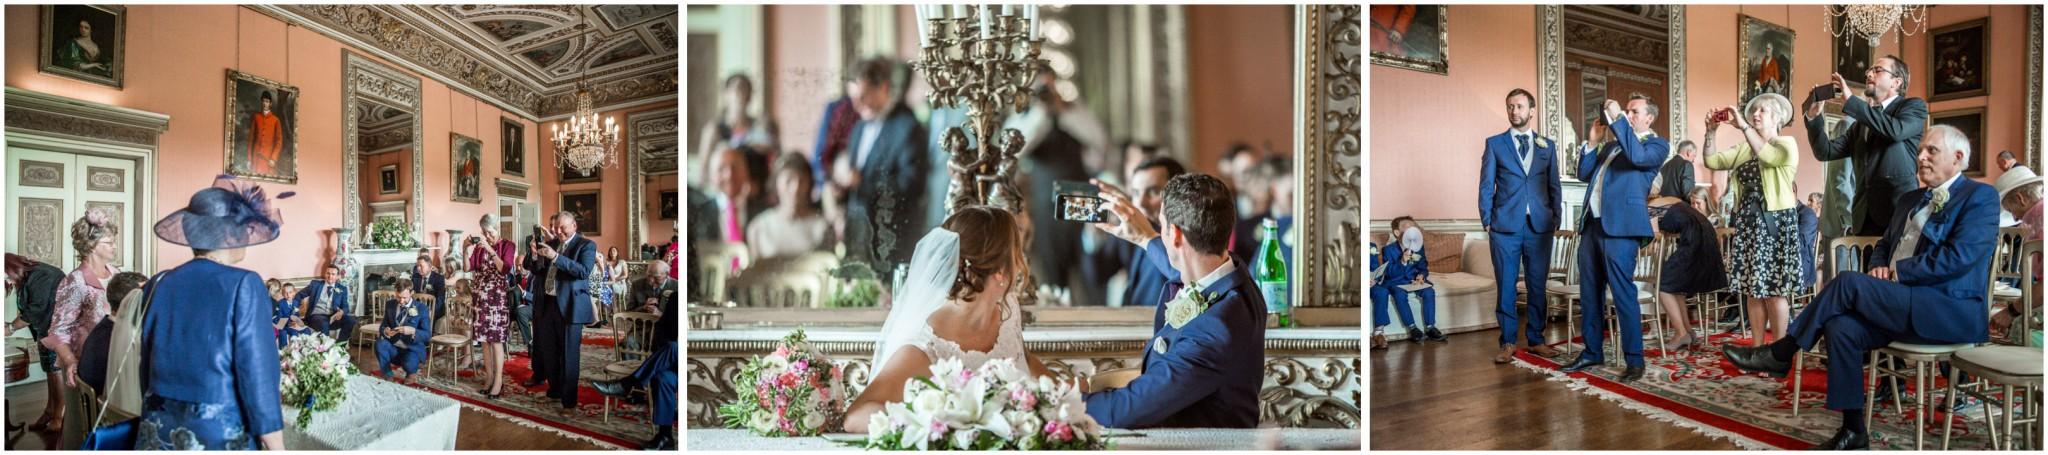 Avington Park Wedding Signing of the Register Selfie